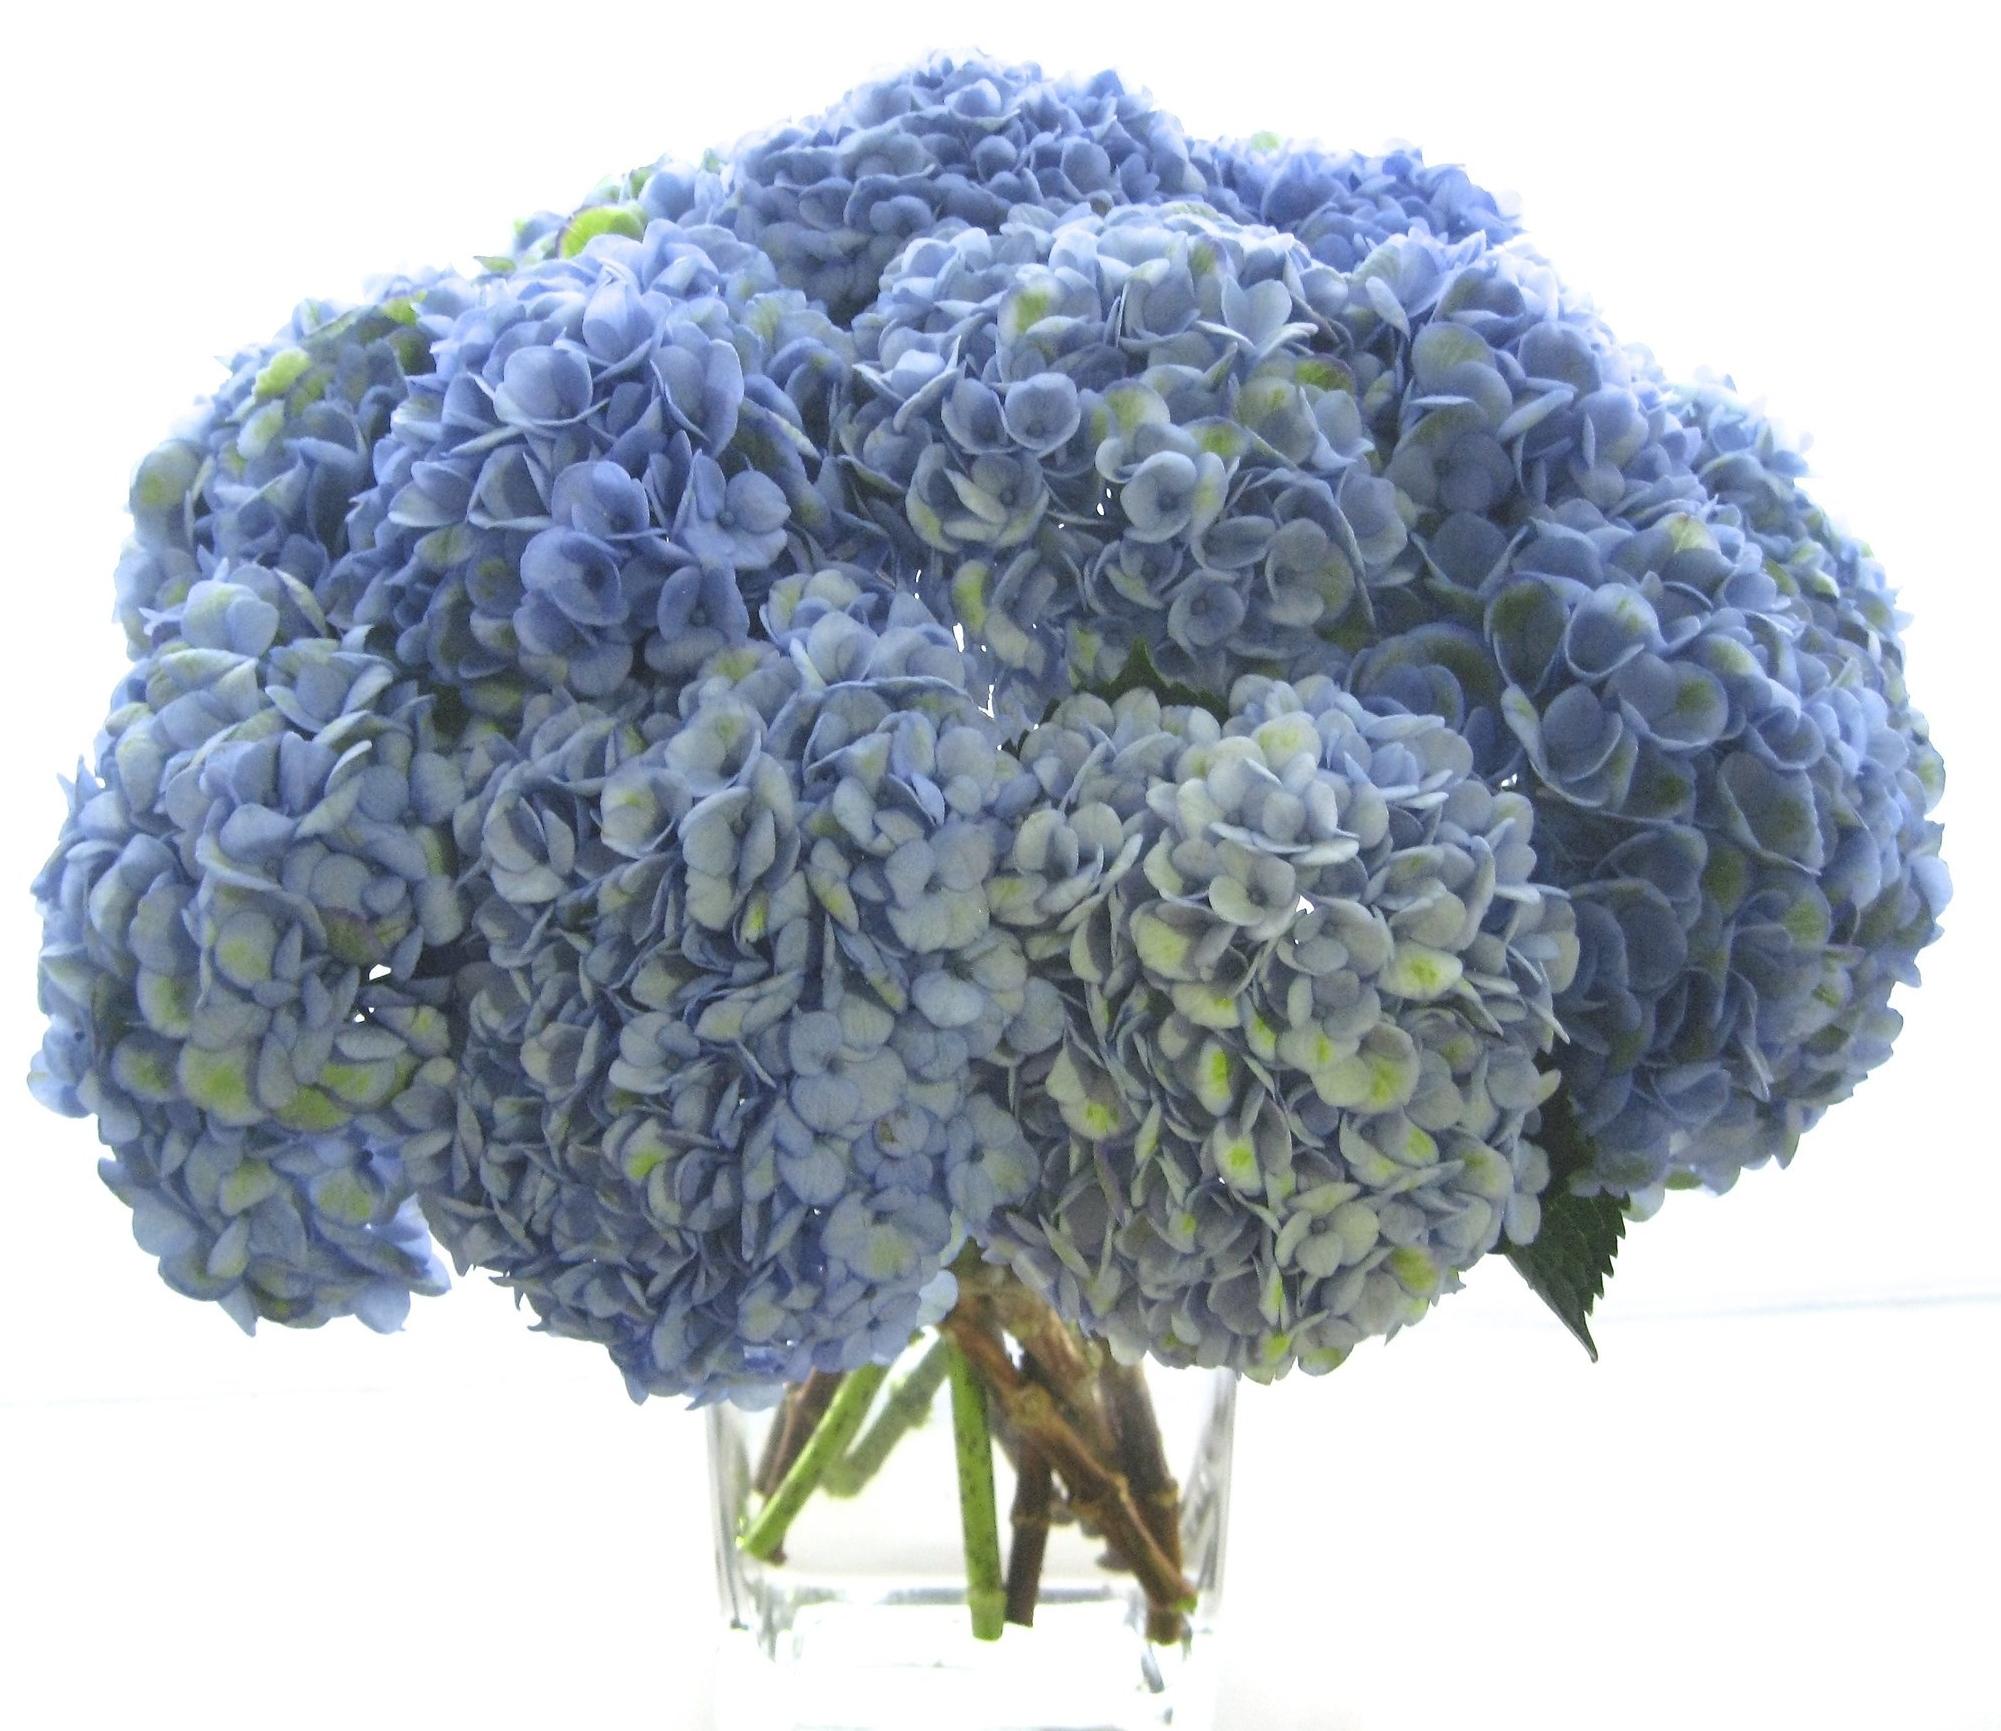 Marine Blue Hydrangea starts at $200